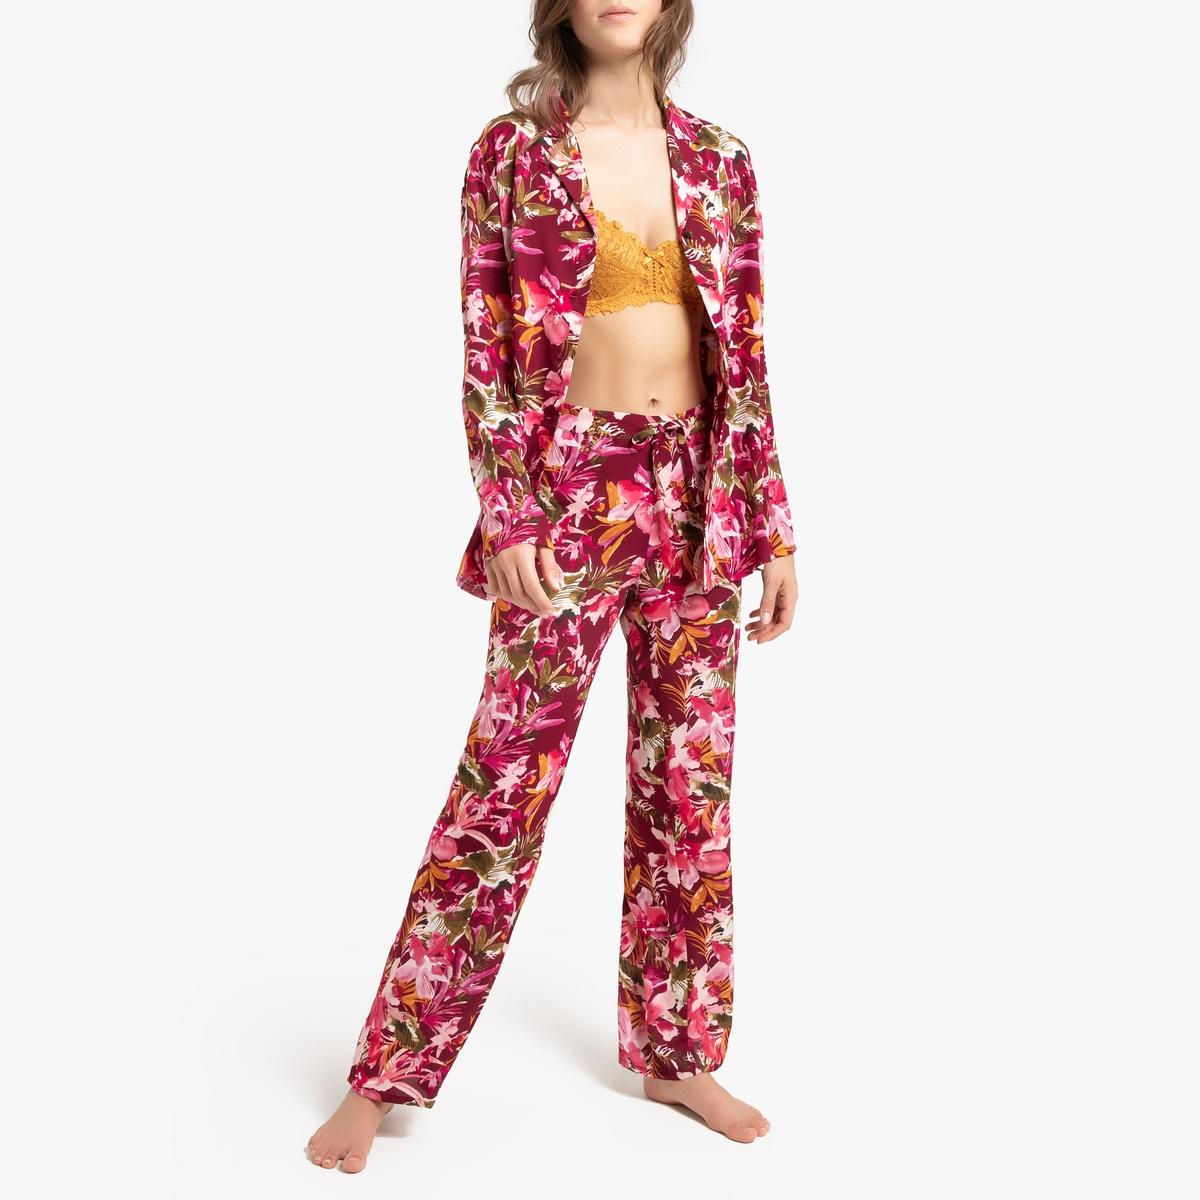 Pijama estampado de manga larga